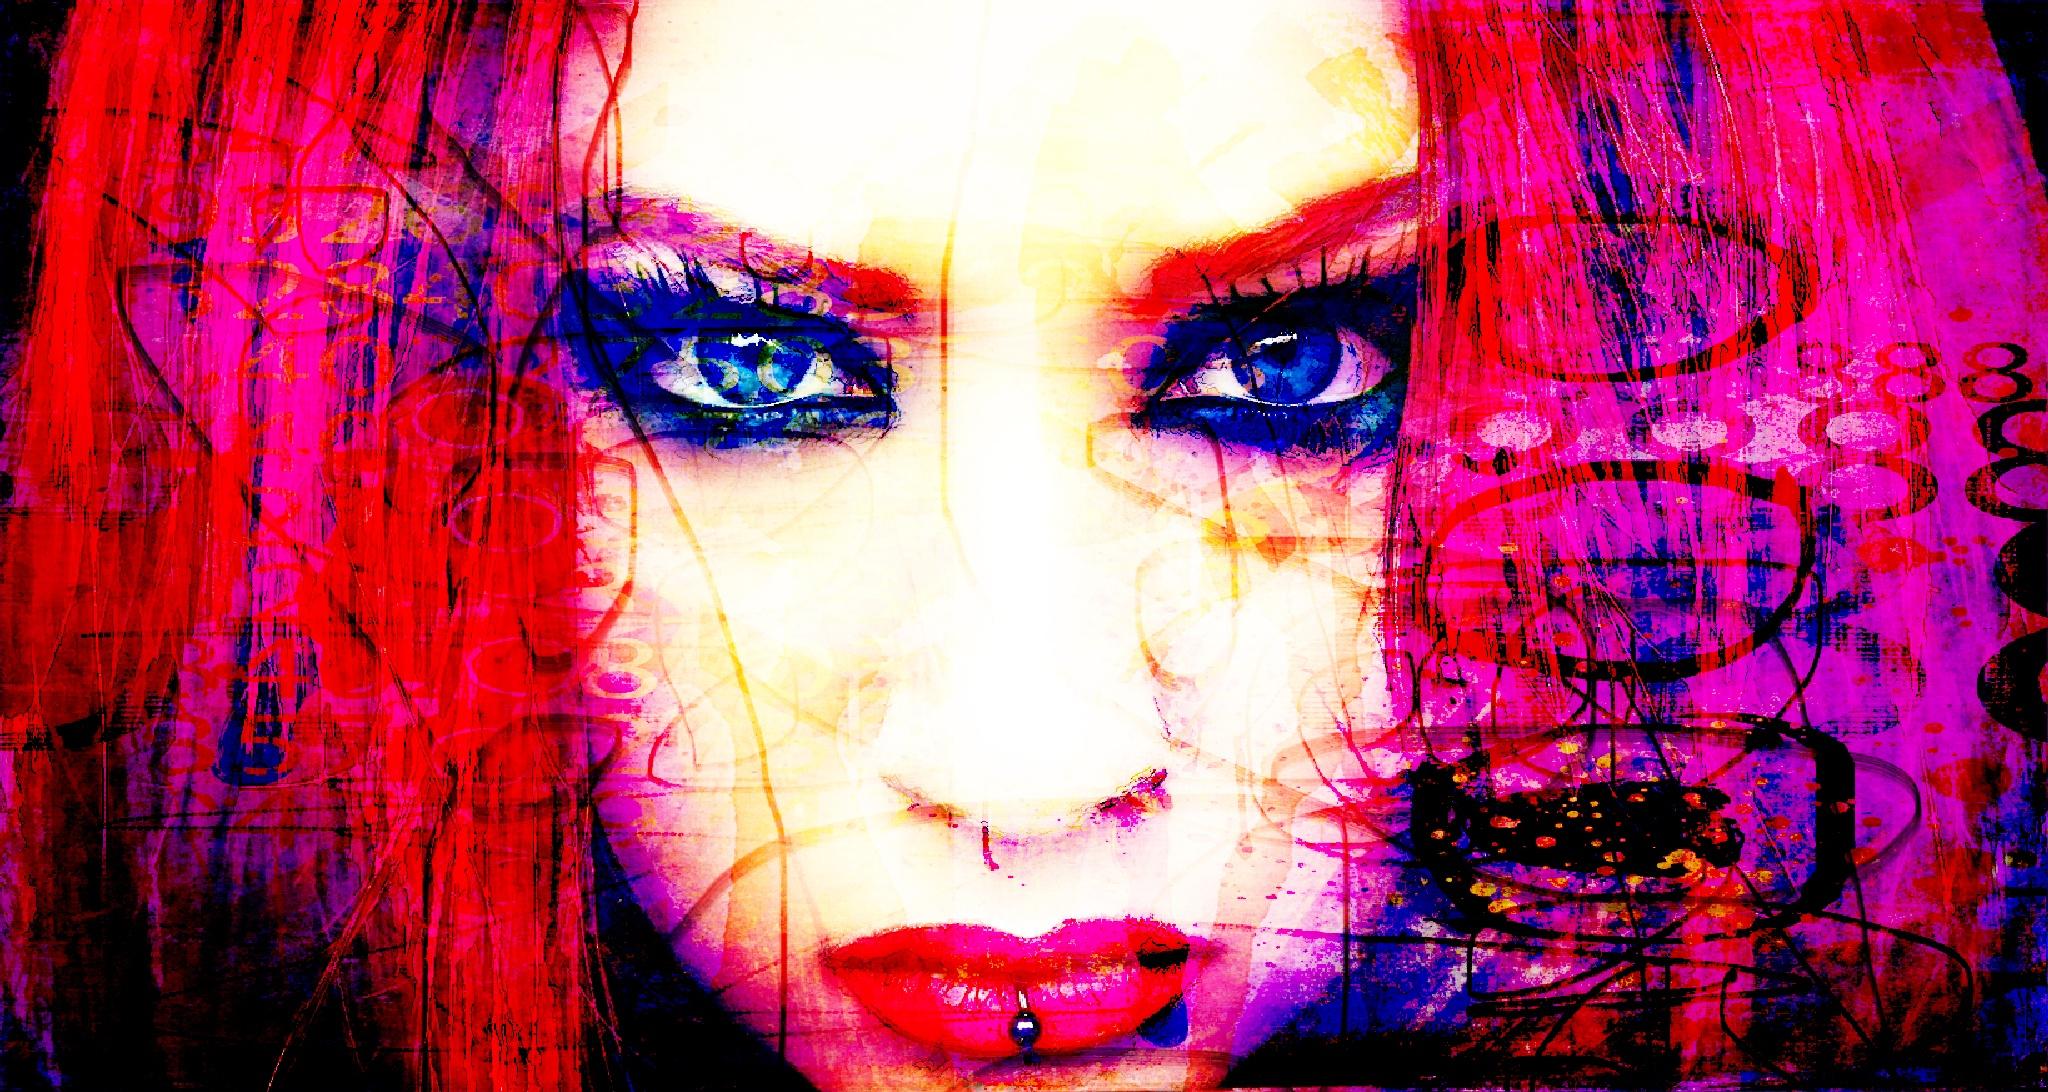 Gothic Girl by mminoguekarlsson